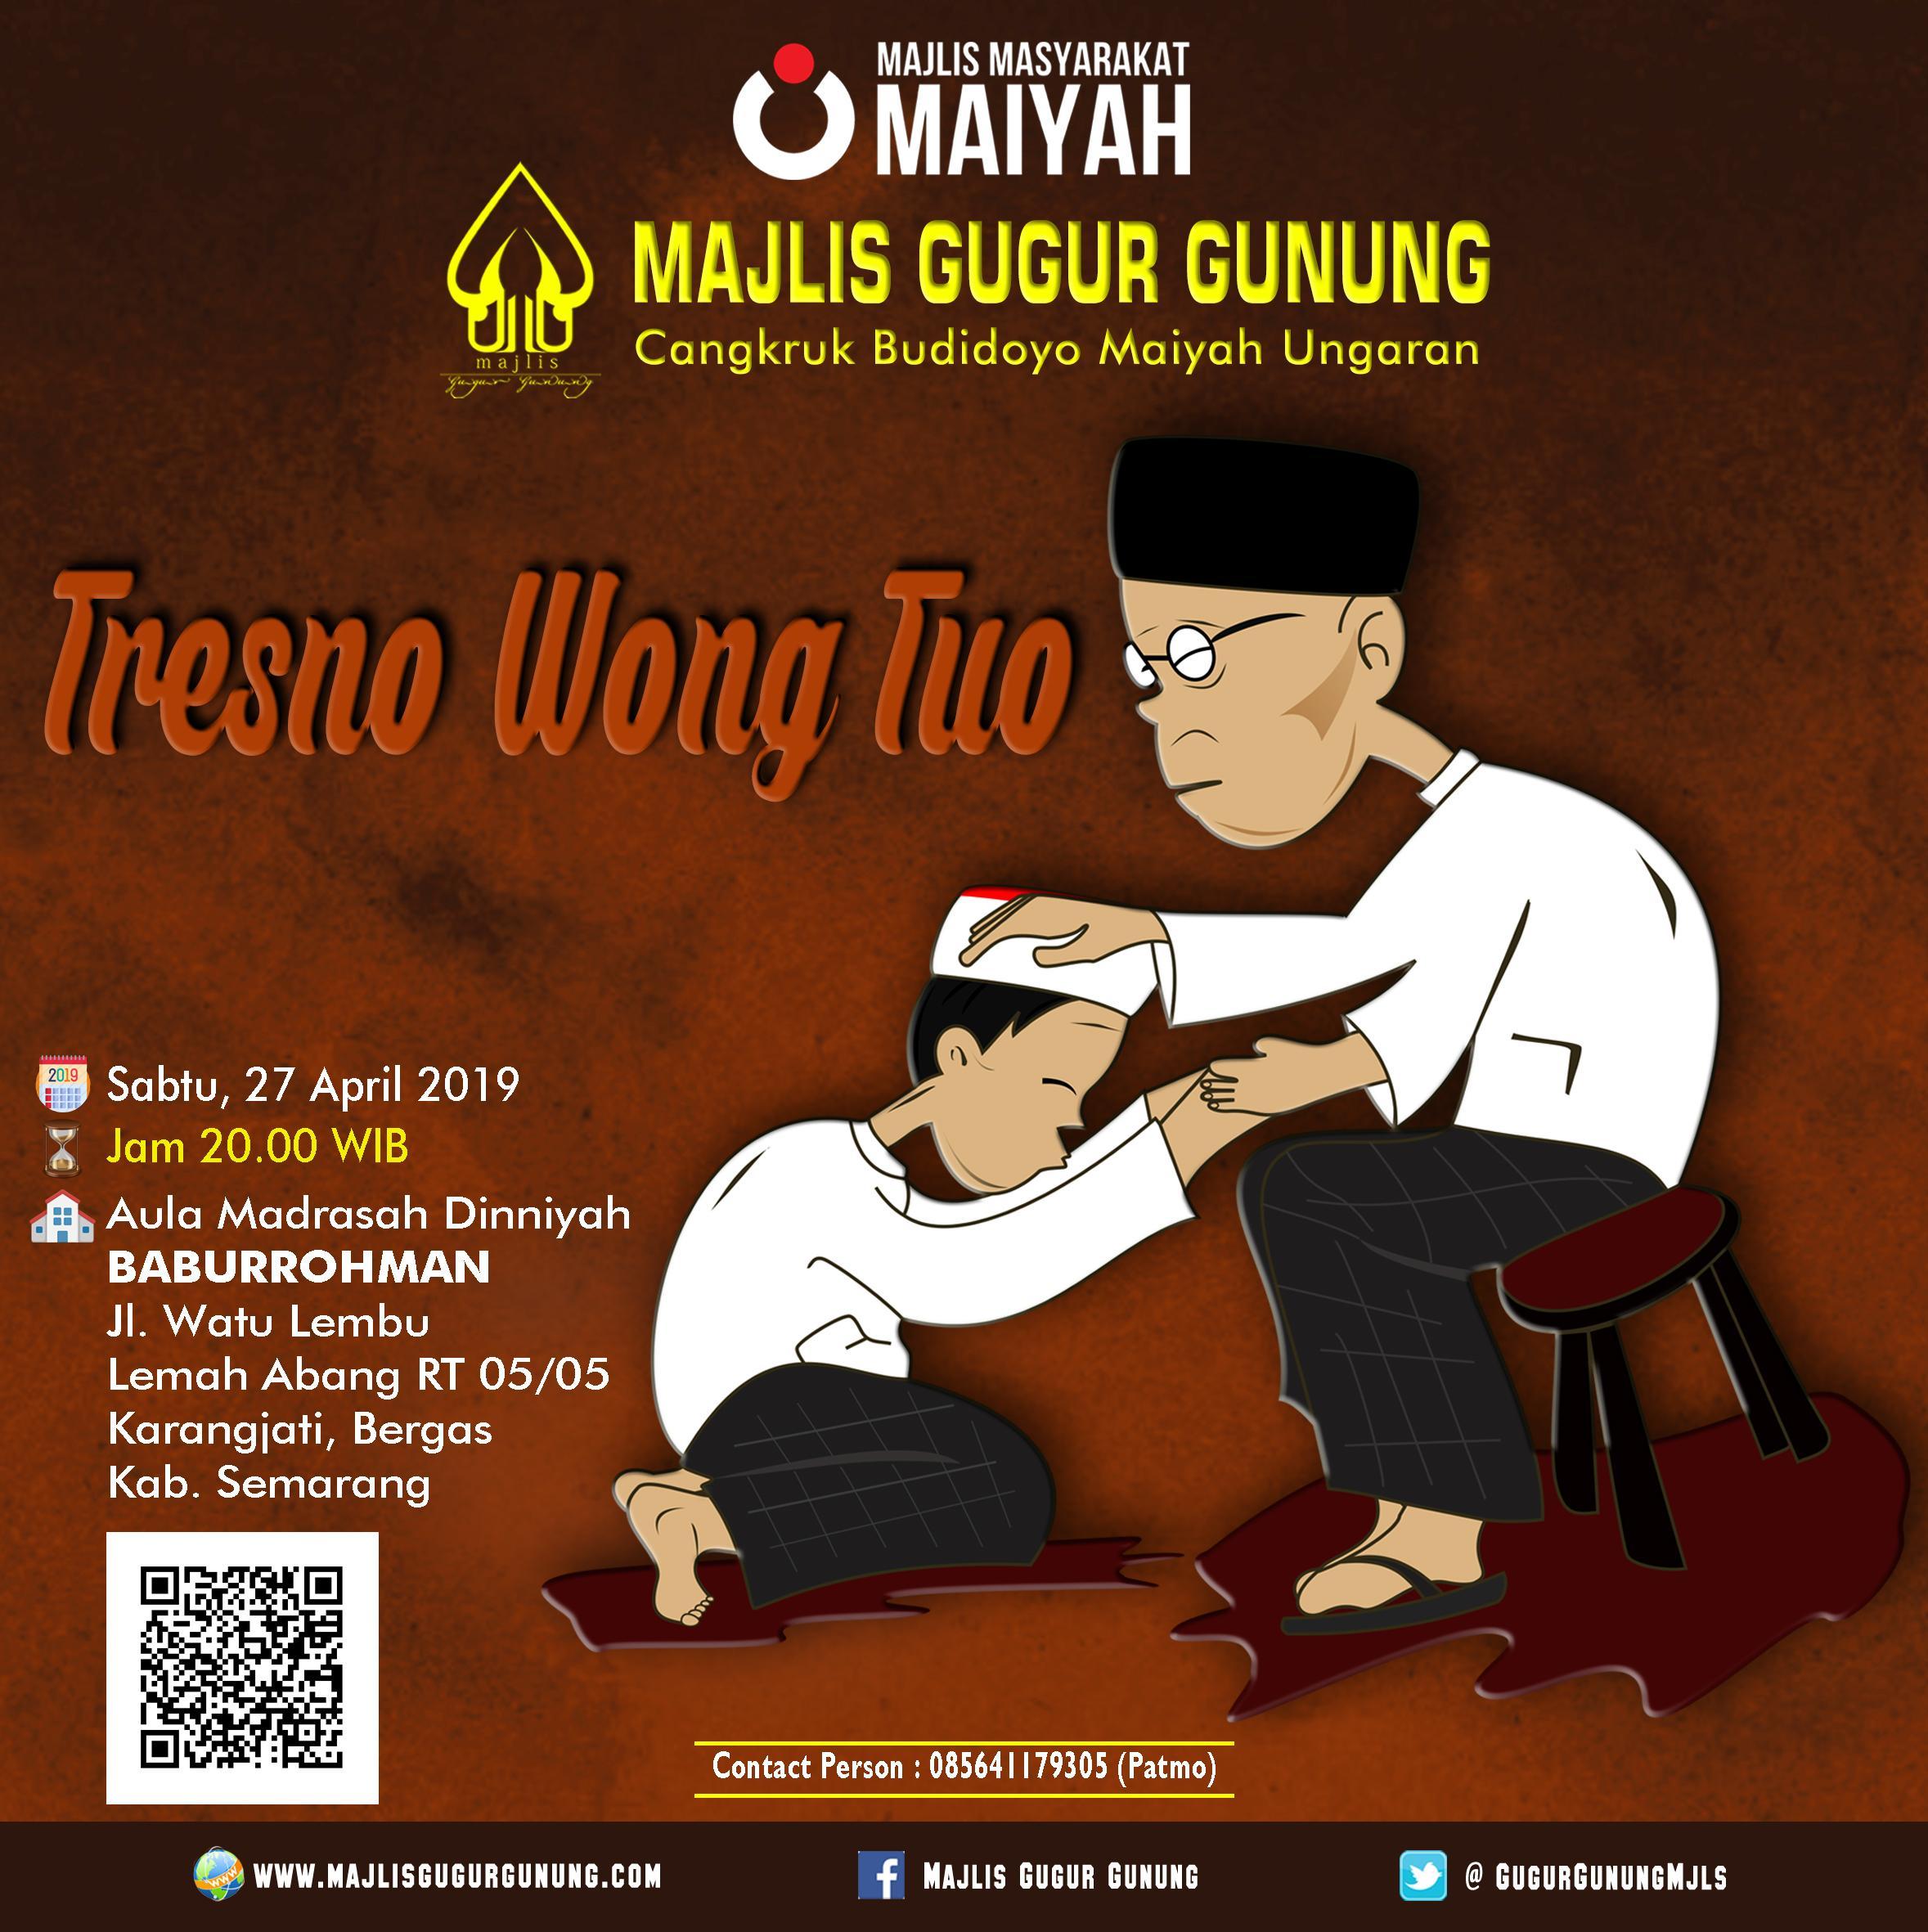 Tresno Wong Tuo